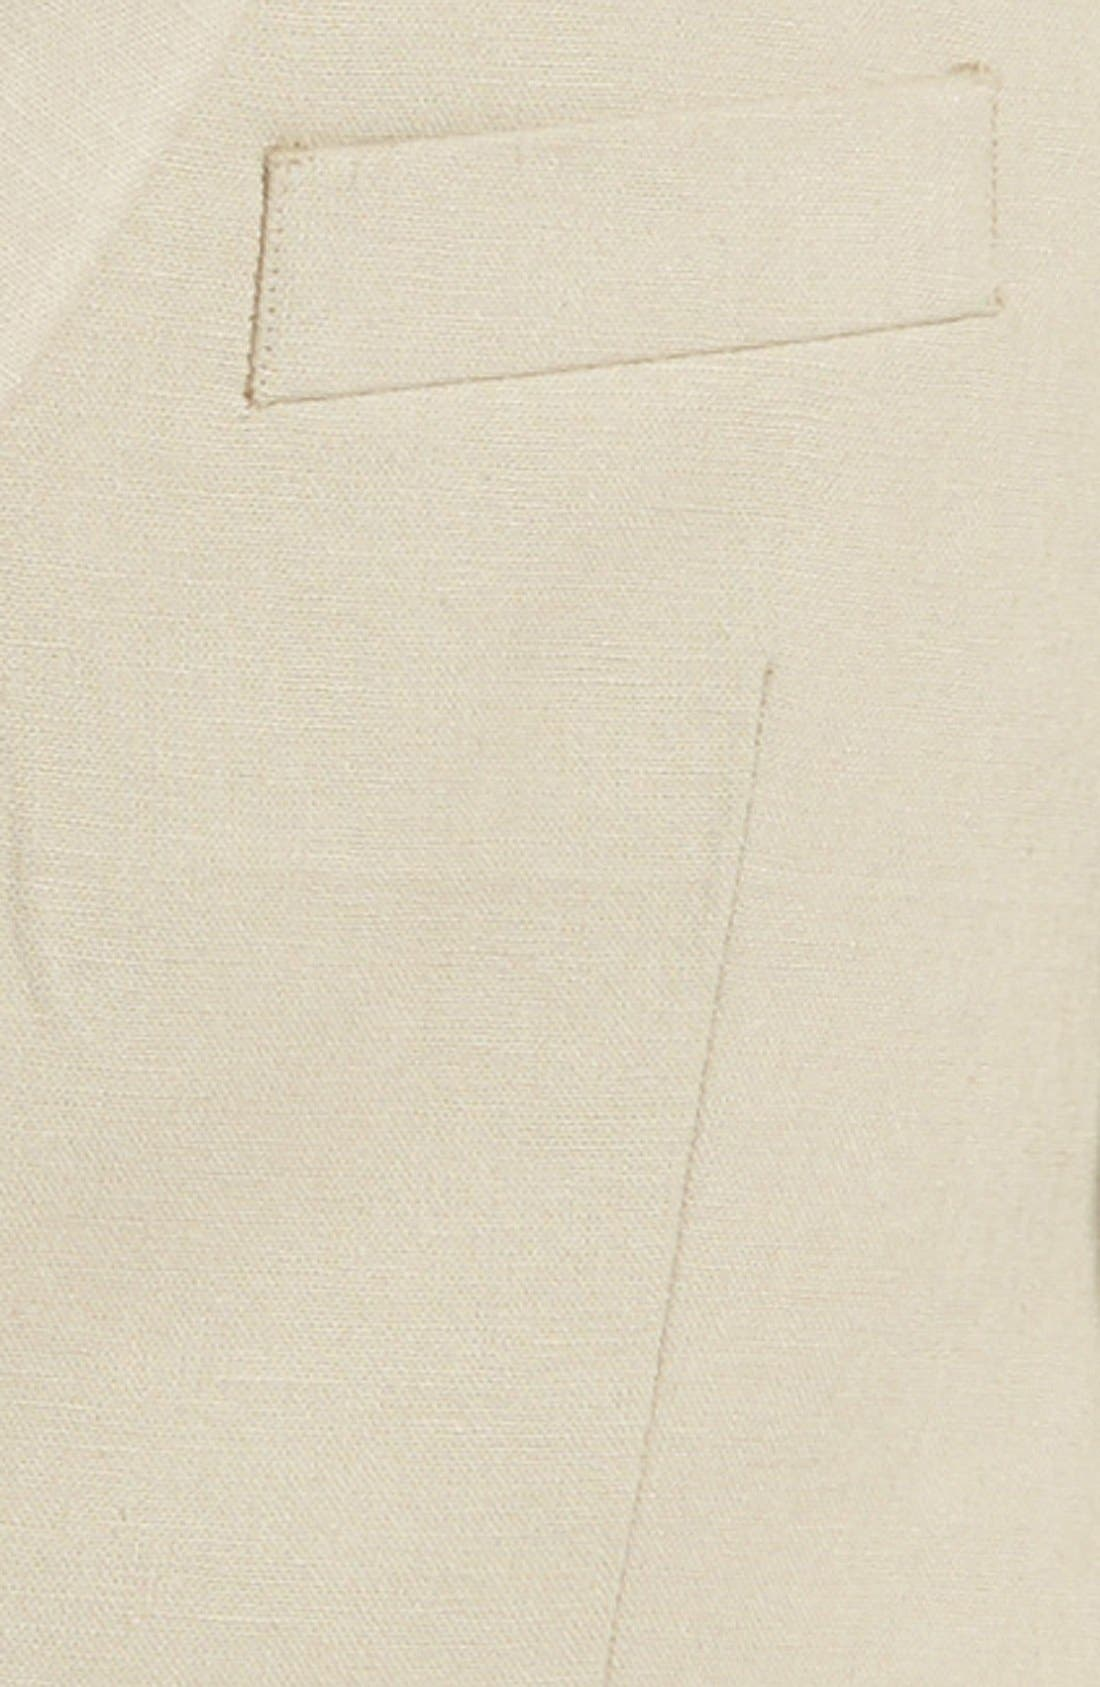 MICHAEL KORS, Linen Blend Blazer, Alternate thumbnail 2, color, TAN